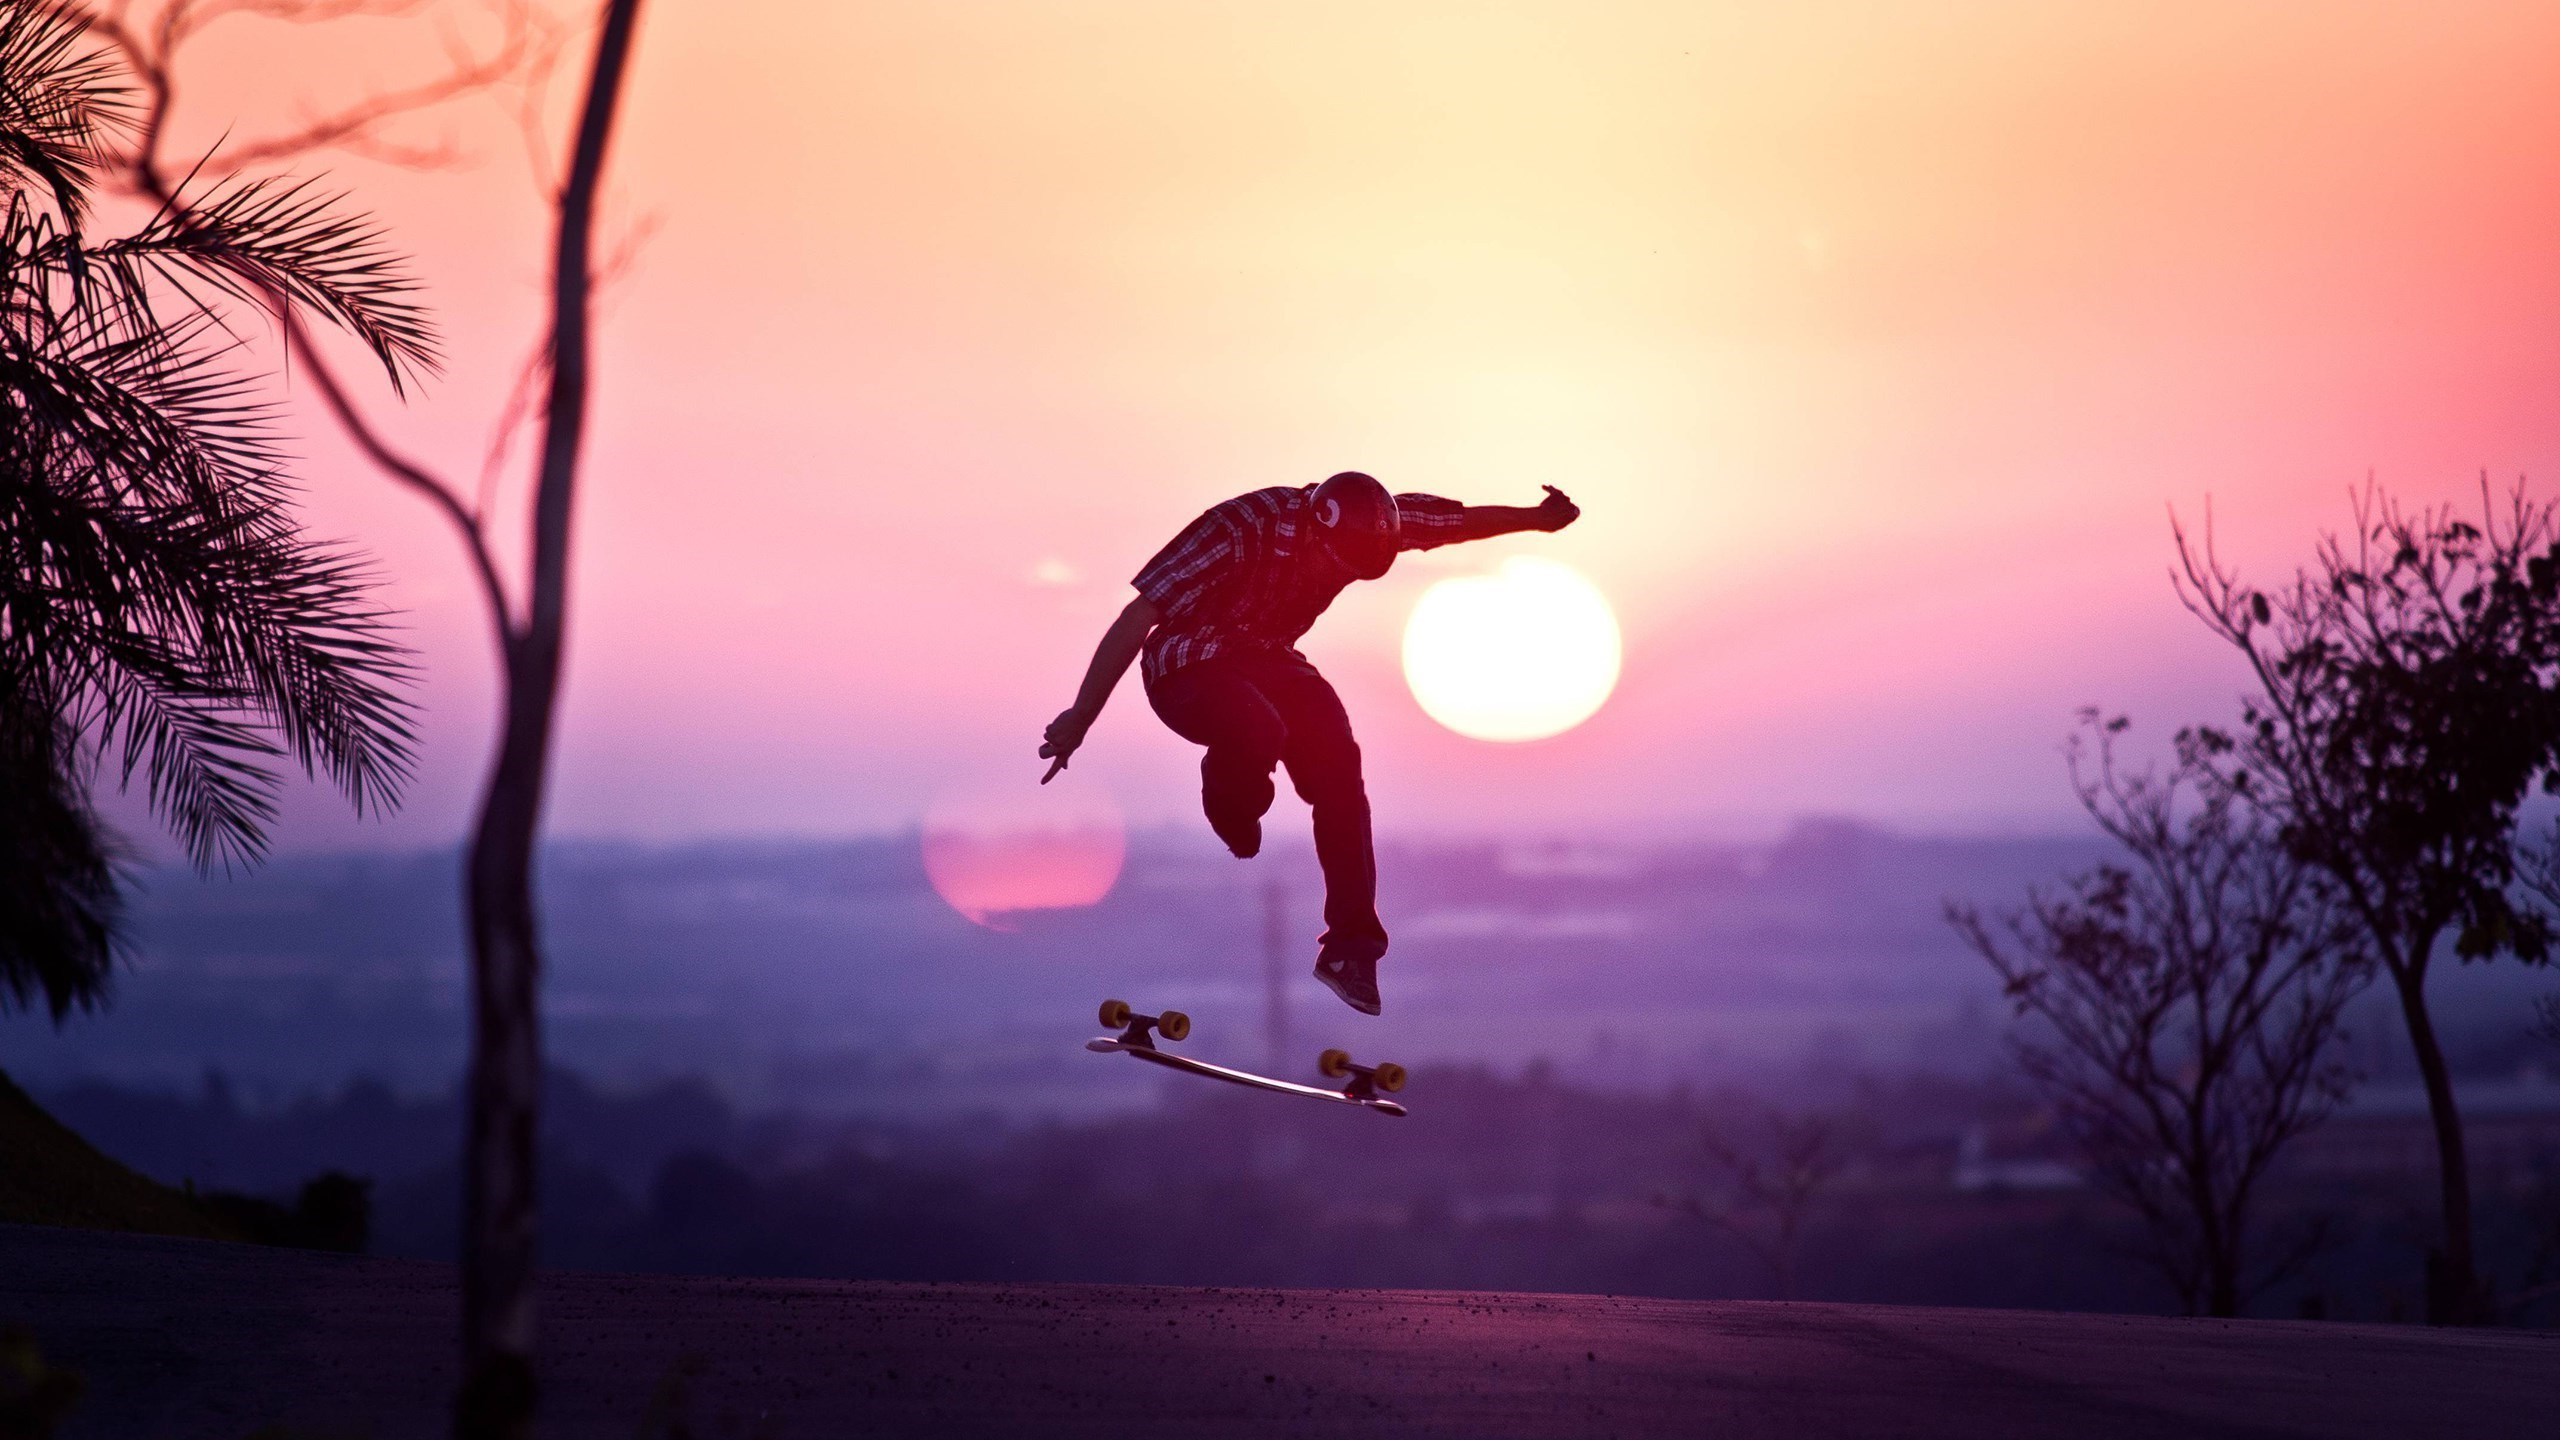 Cool Skateboard Backgrounds